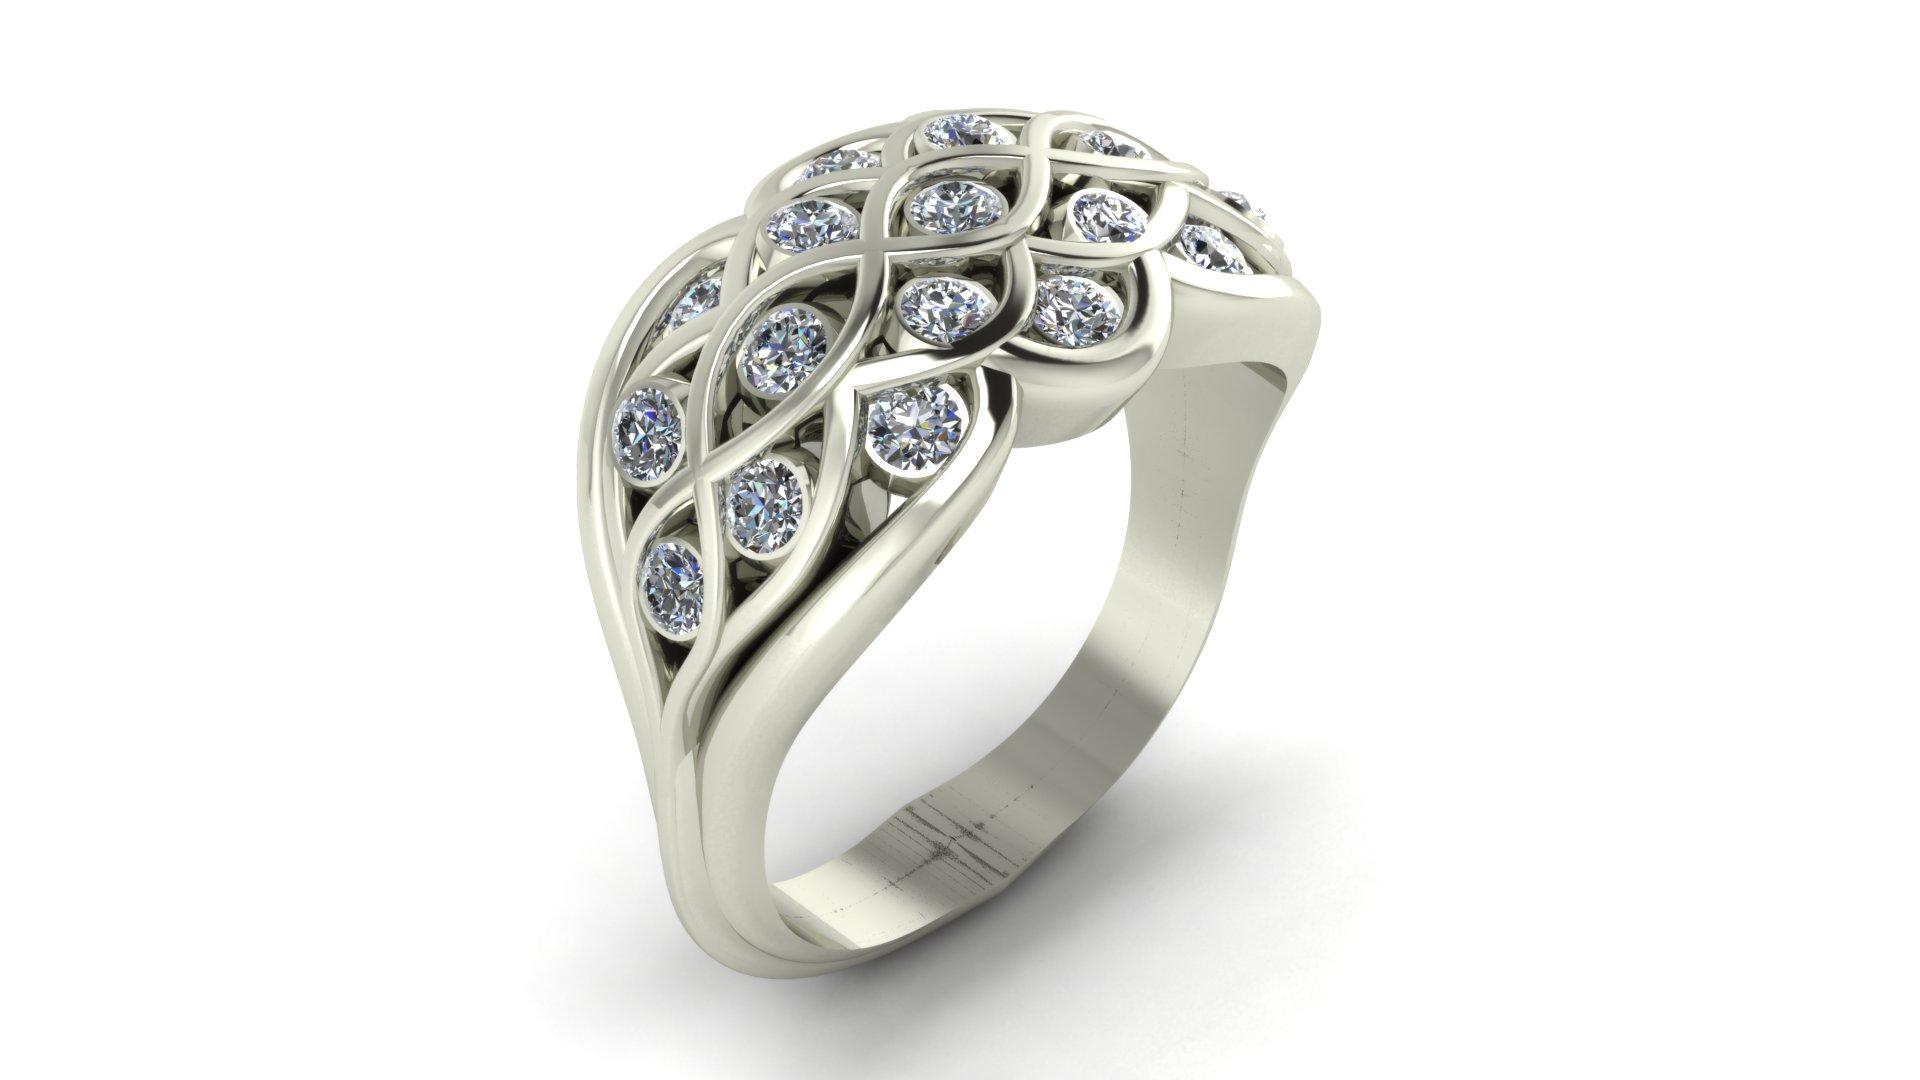 WOVEN DIAMOND RING